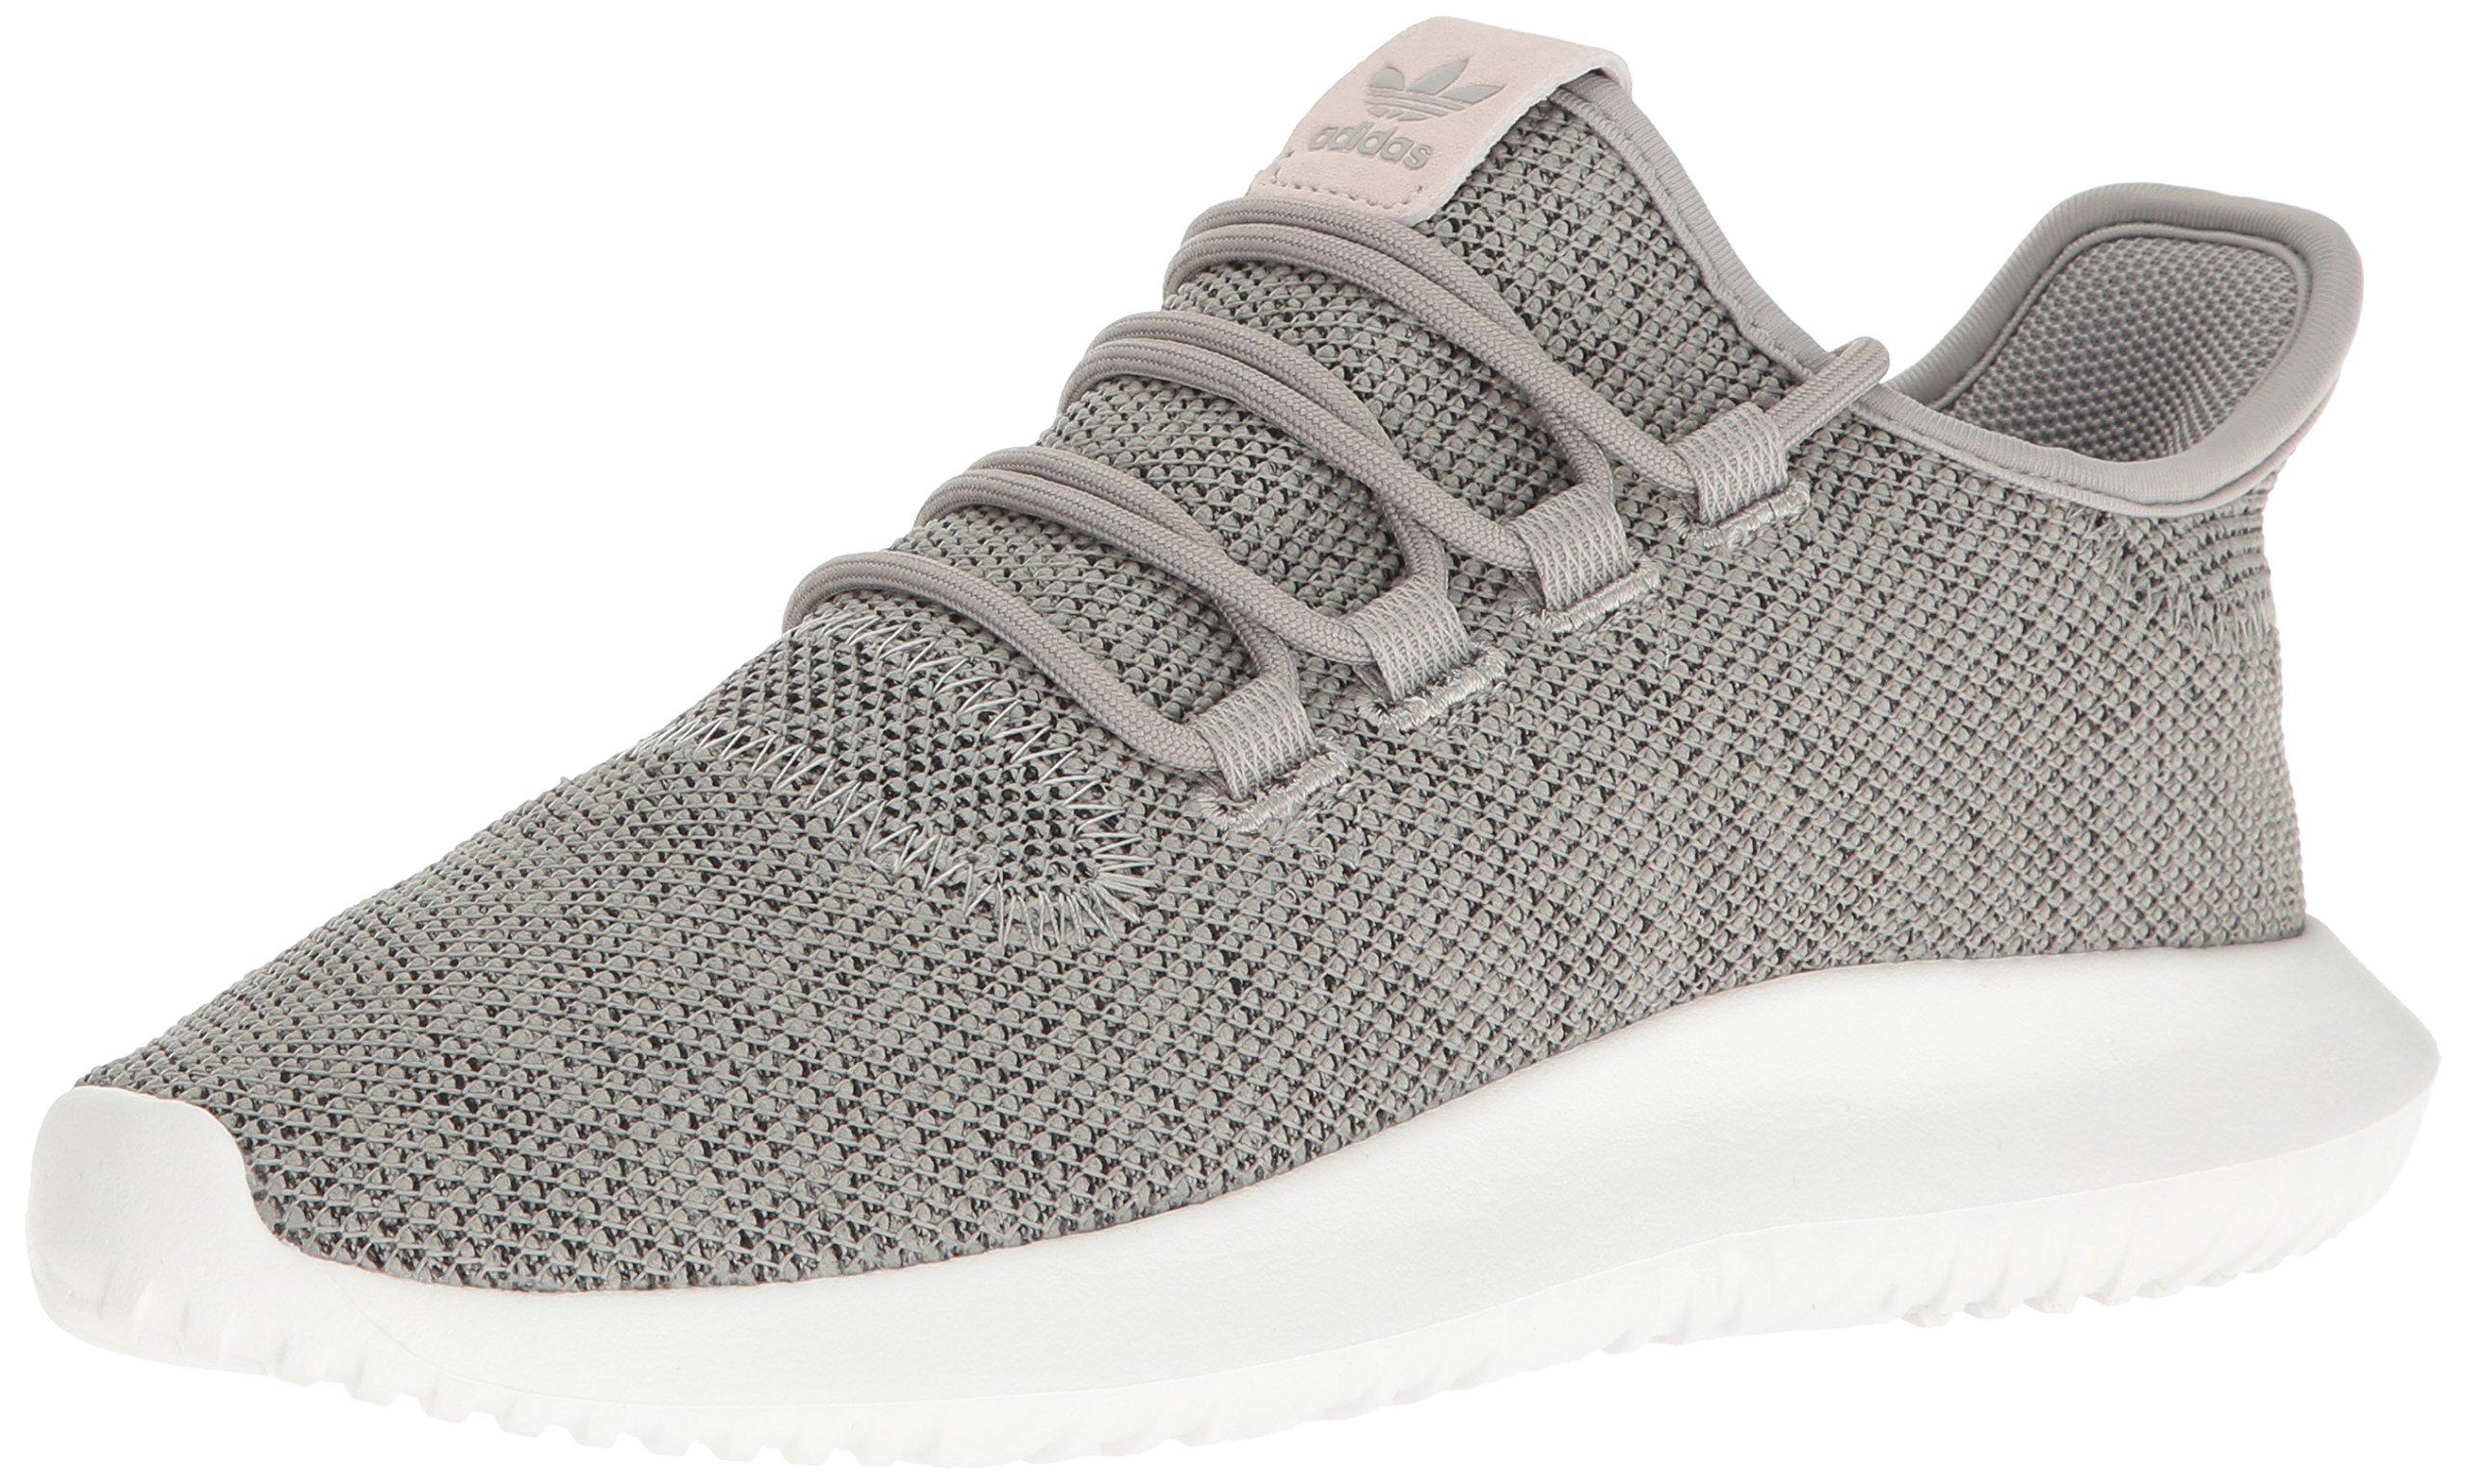 adidas Originals Women's Shoes | Tubular Shadow Fashion Sneakers, Medium Grey Heather/Sharp Grey/White, (7 M US)